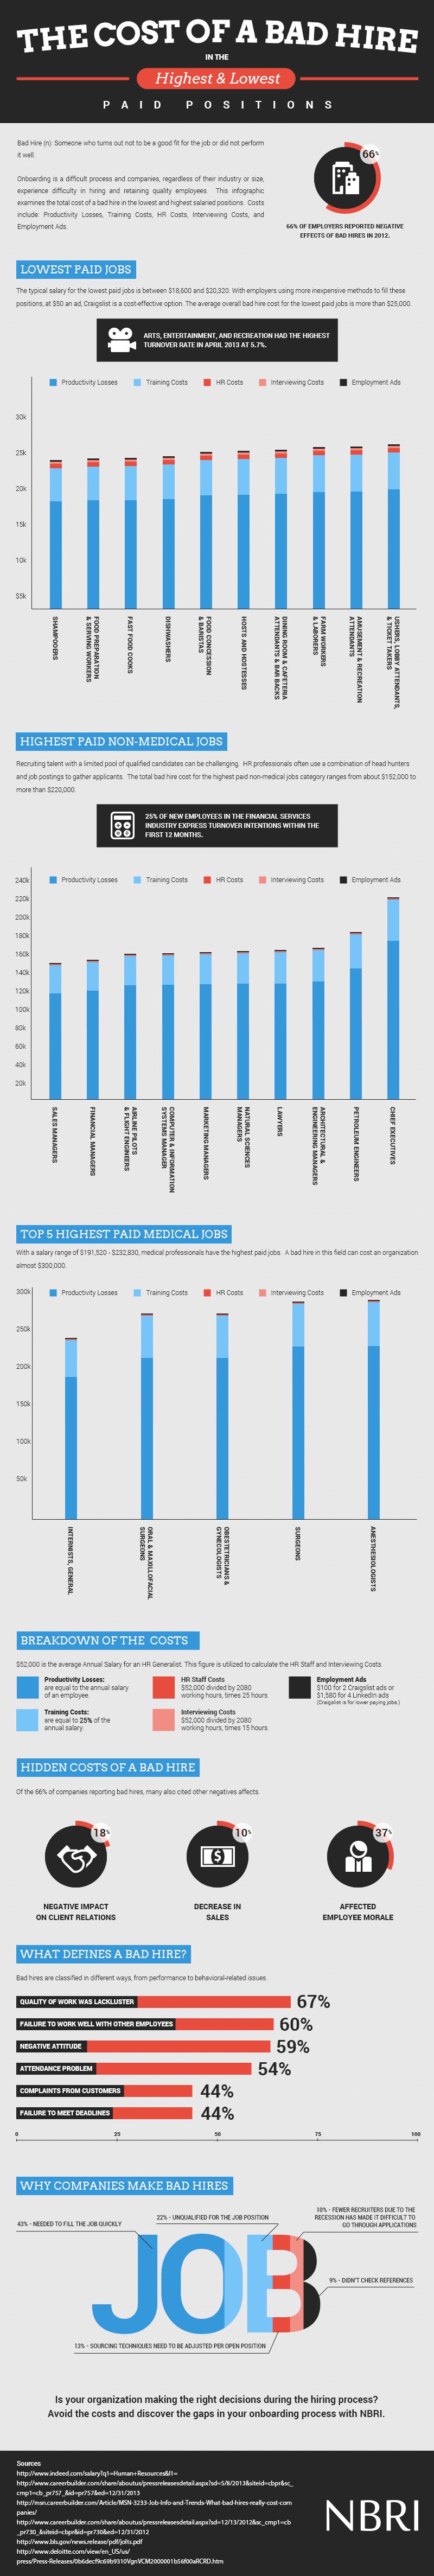 Bad Hire Statistics-Infographic